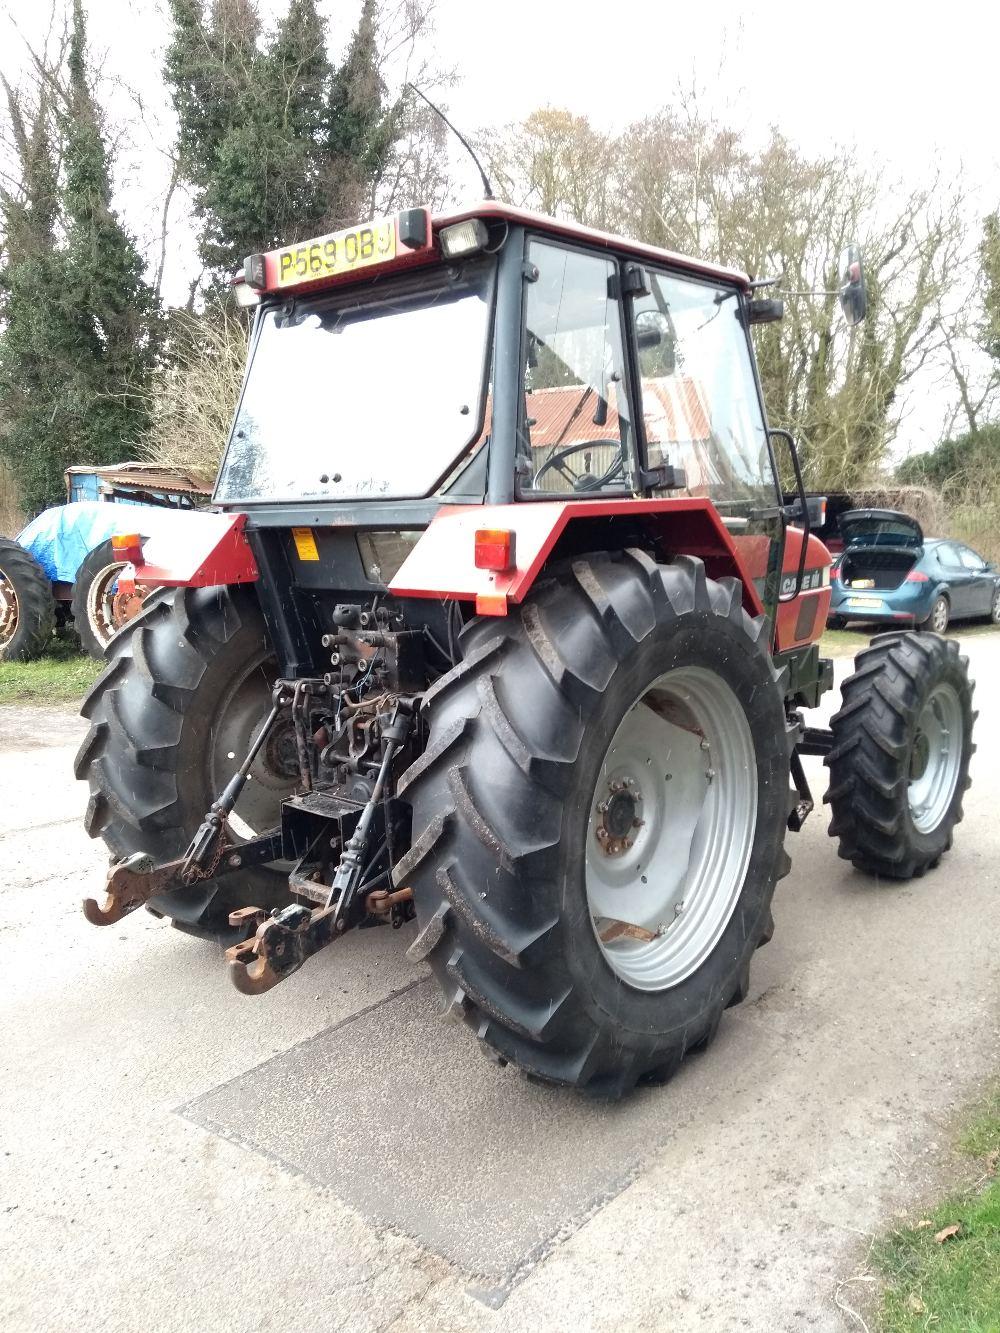 Lot 37 - Case IH 4230 tractor, 1996, Reg: P569 0BJ, diesel, 3,515 hours, V5, RFL expiry date: 01.08.